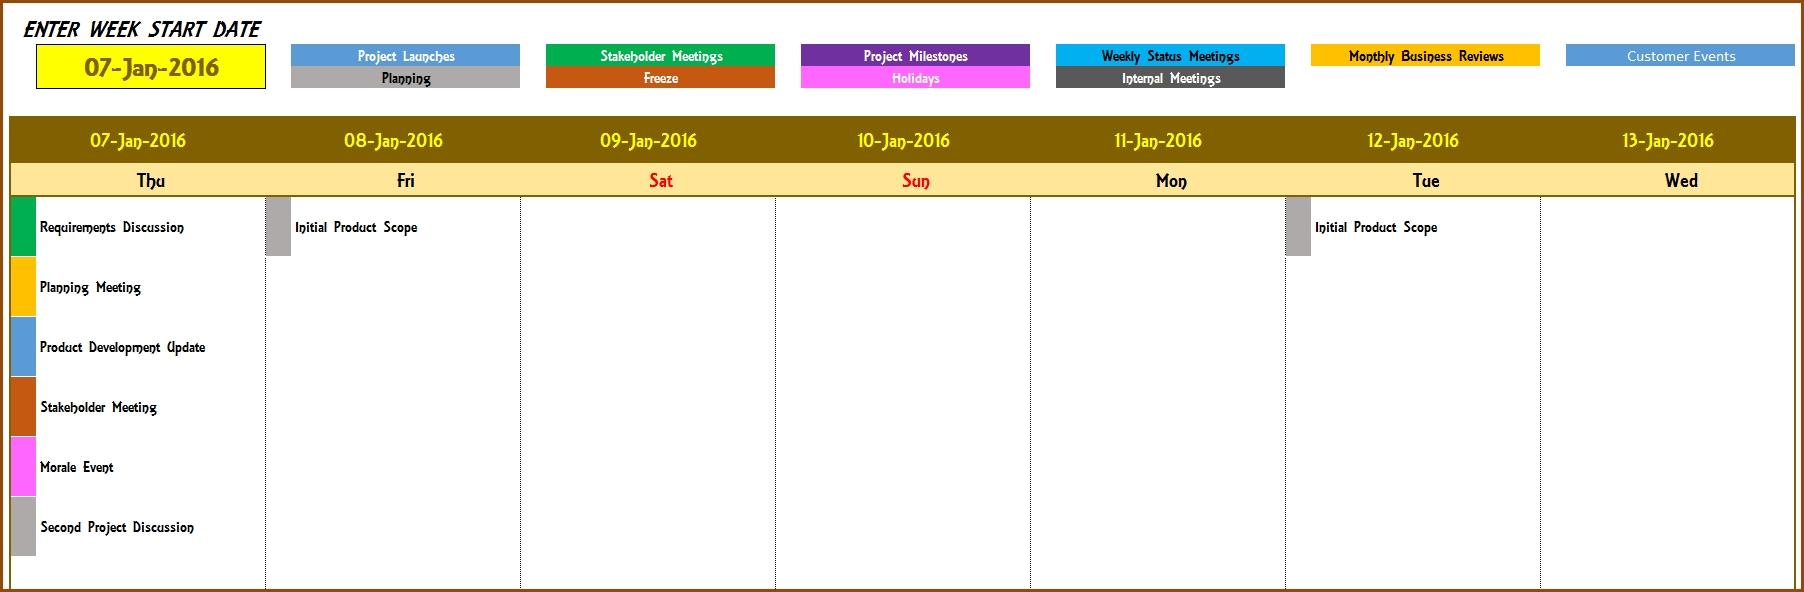 2016 Weekly Calendar - Event Calendar Maker Excel Template | Event  Template For An Event Calendar